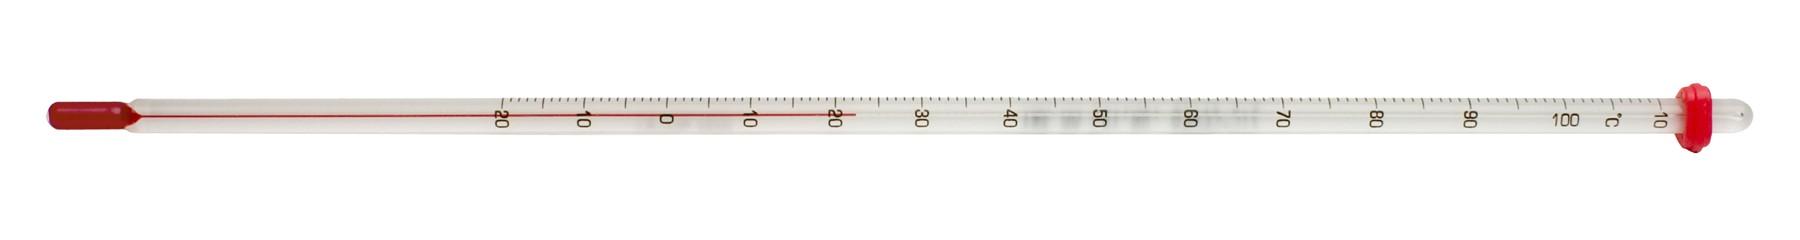 SP Bel-Art, H-B DURAC General Purpose Liquid-In-Glass Laboratory Thermometer; -20 to 150C, 76mm Immersion, Organic Liquid Fill